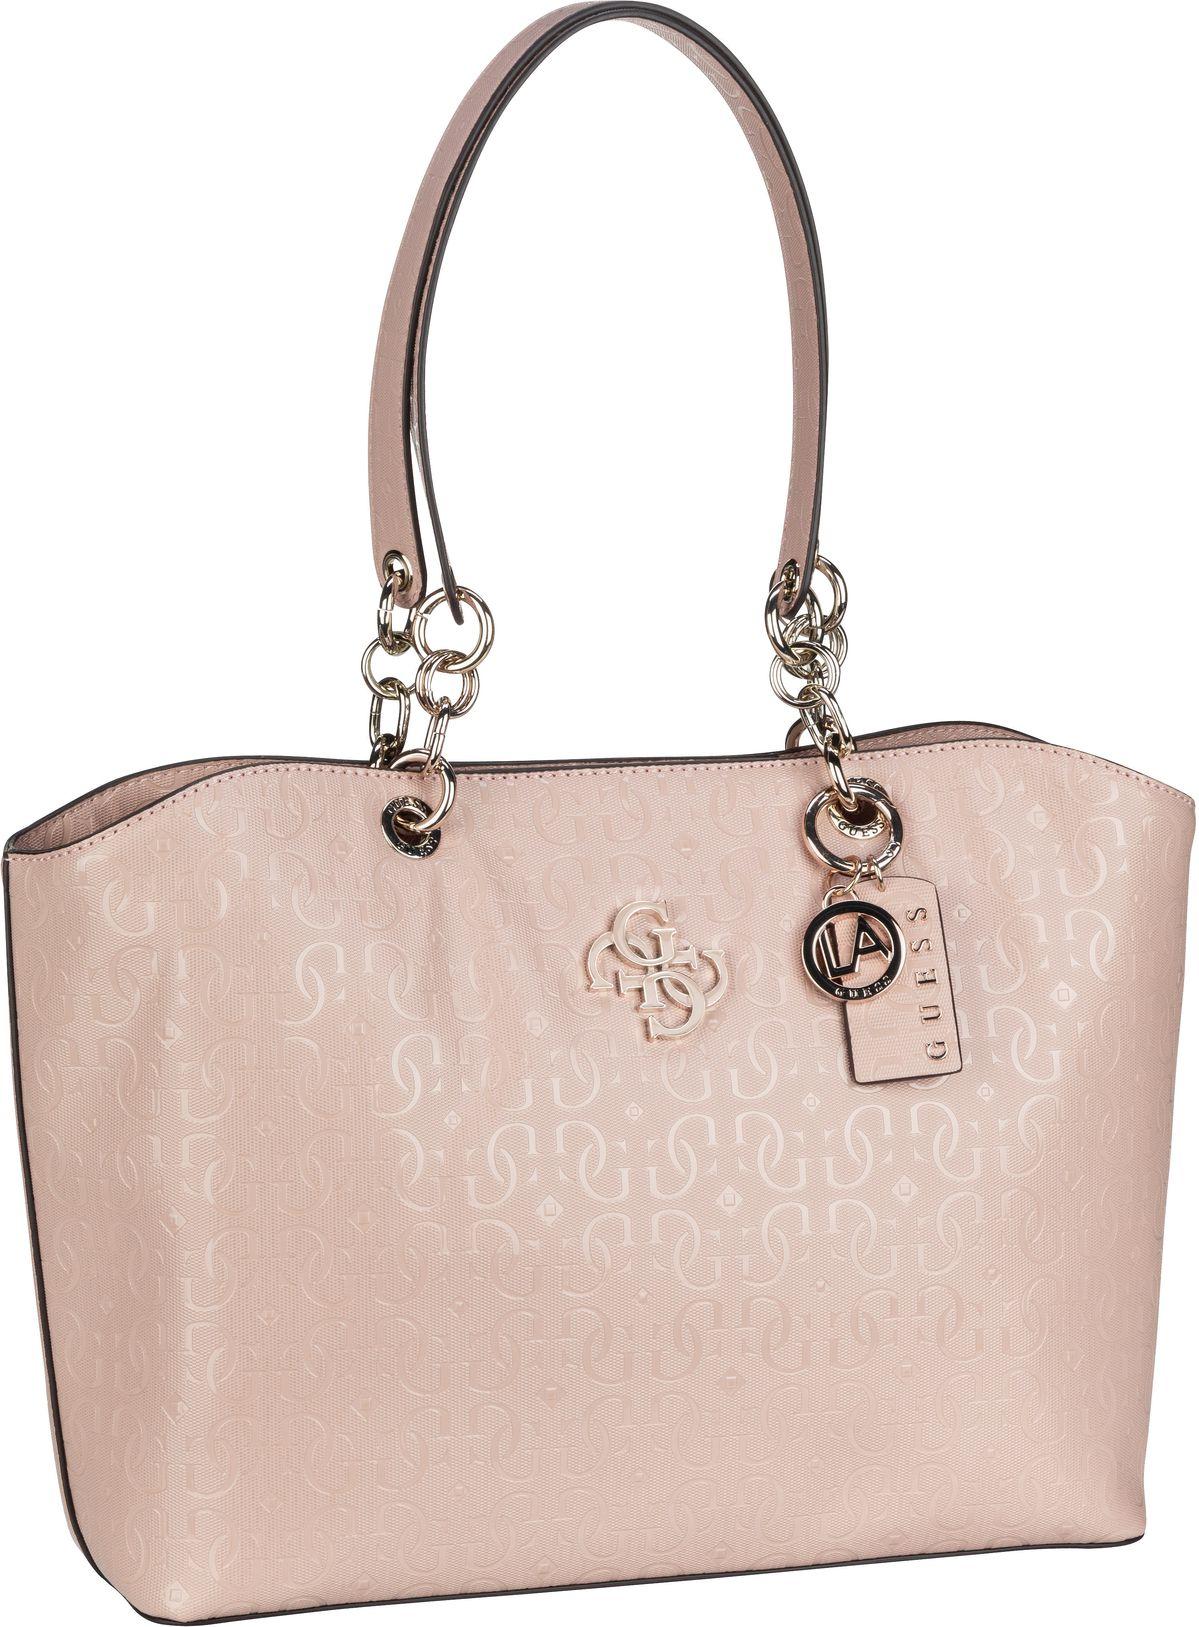 Handtasche Chic Shine Tote Blush